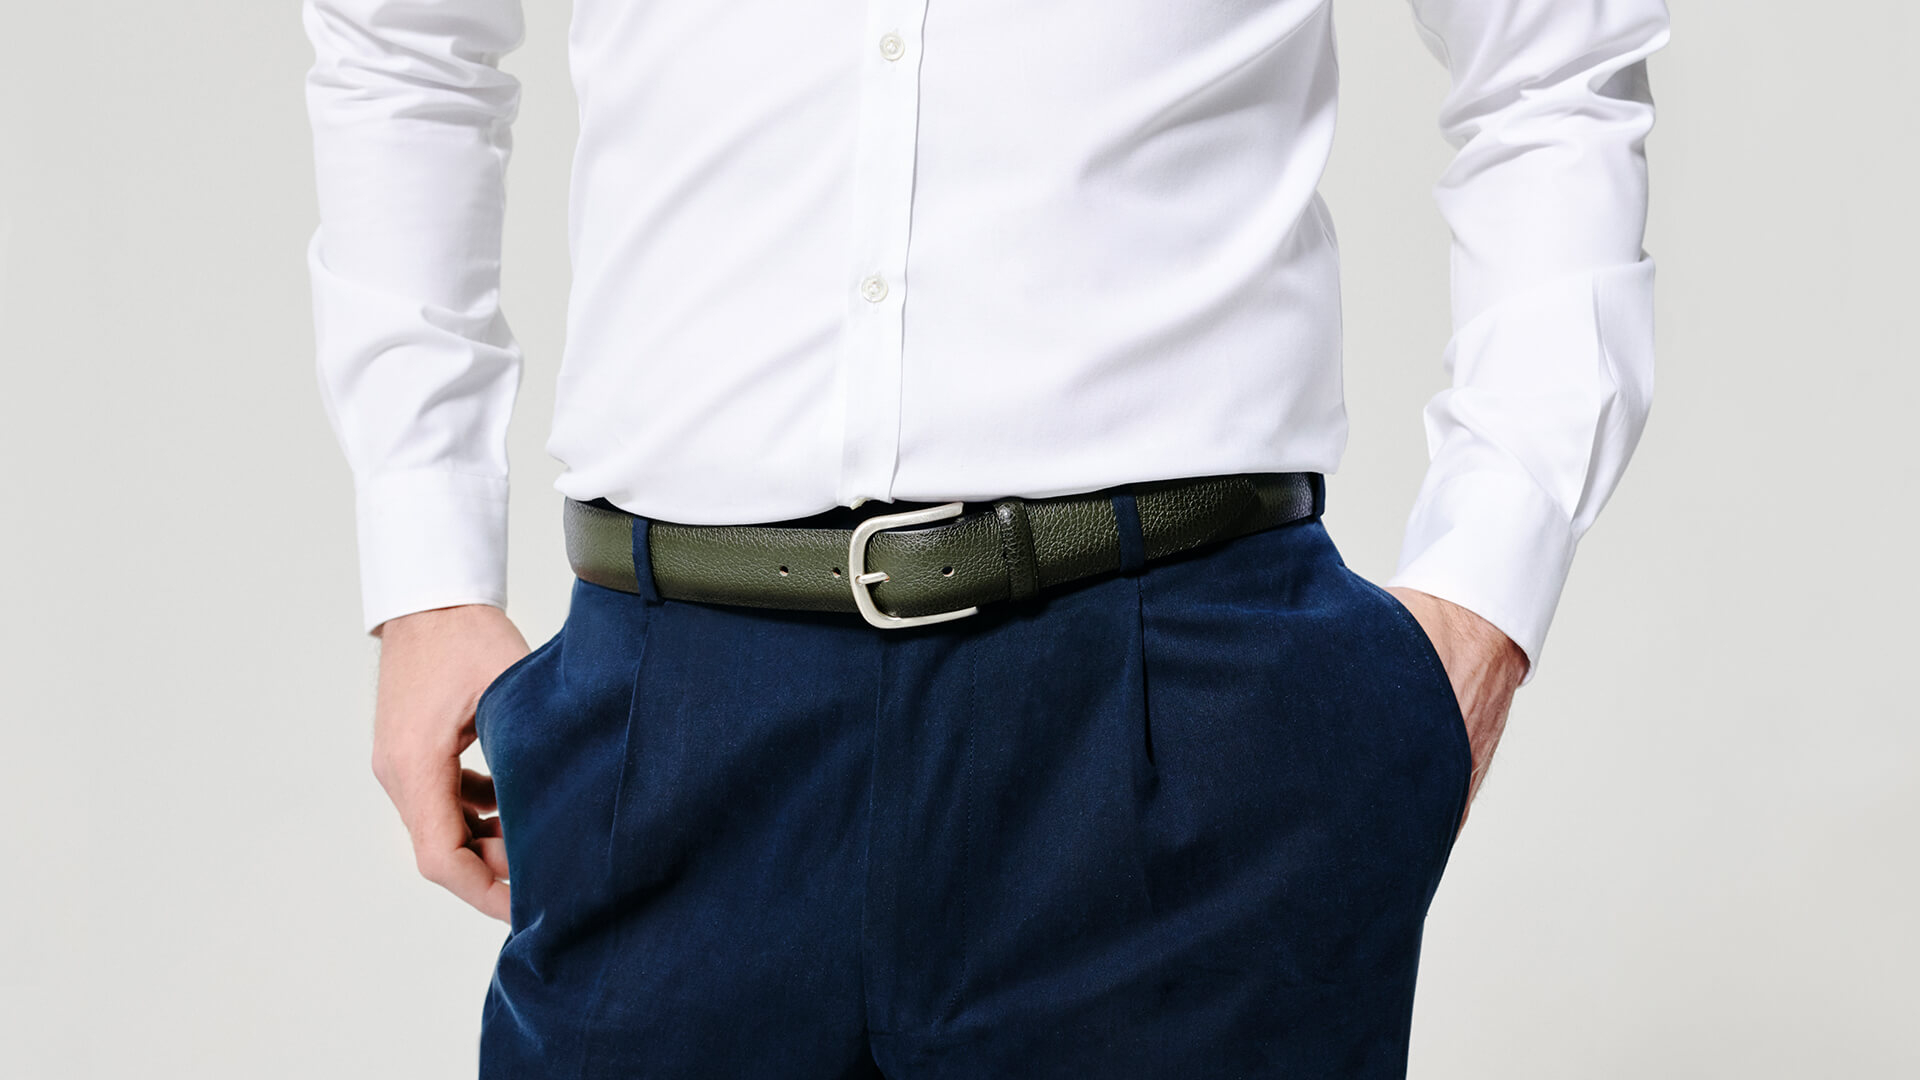 ORCIANI | Man's Belts collection. Leather Belts | Shop online UK